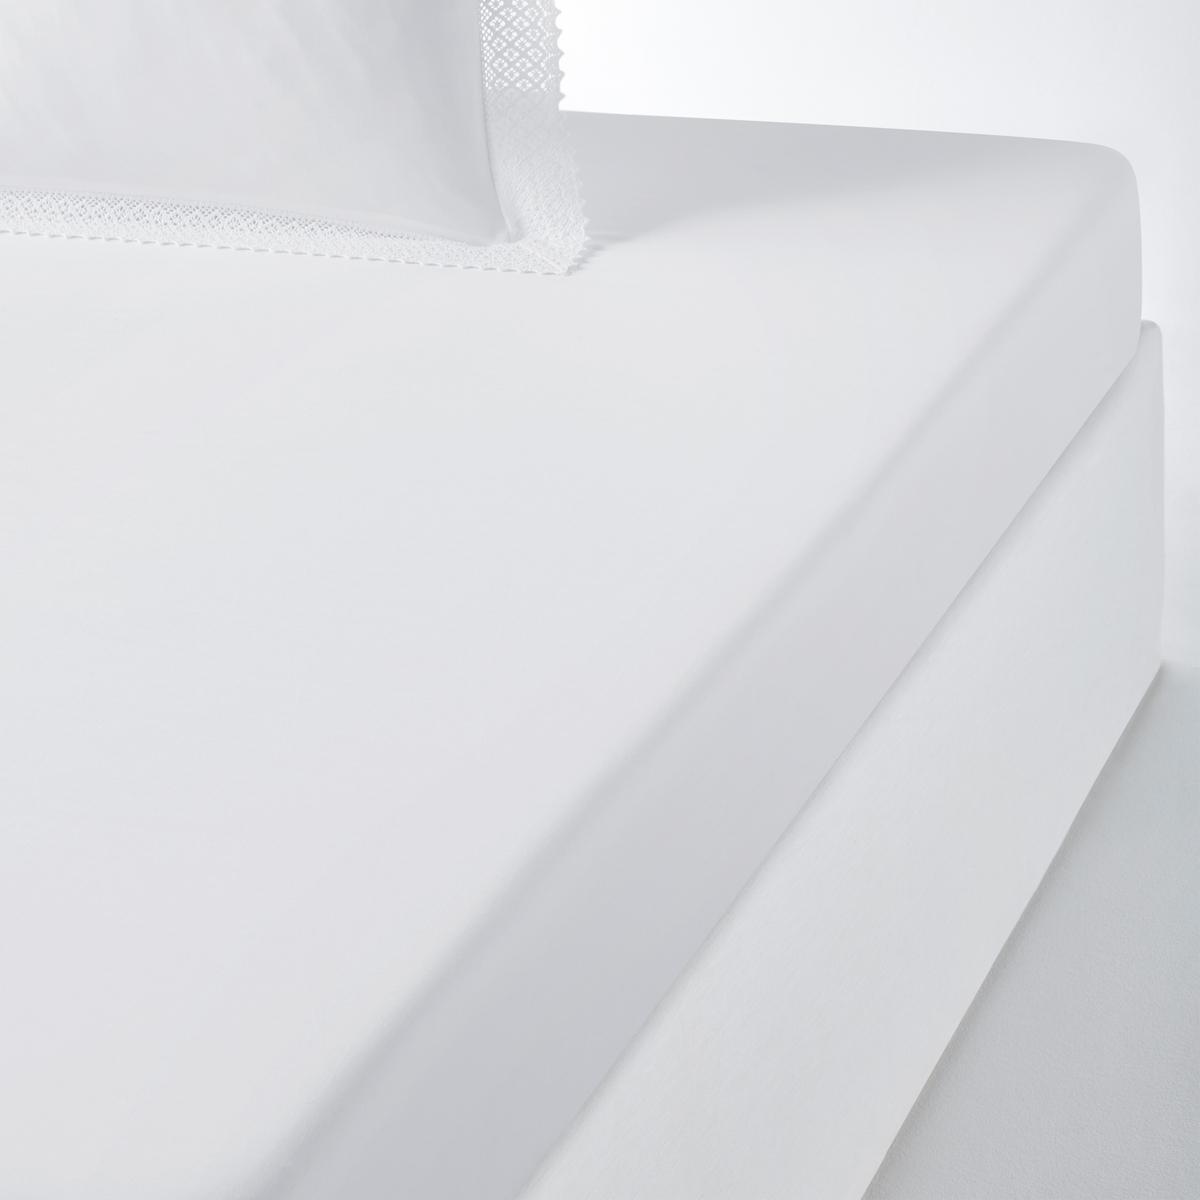 Простыня La Redoute Натяжная DENTELLE 90 x 190 см белый простыня la redoute dentelle 180 x 290 см белый